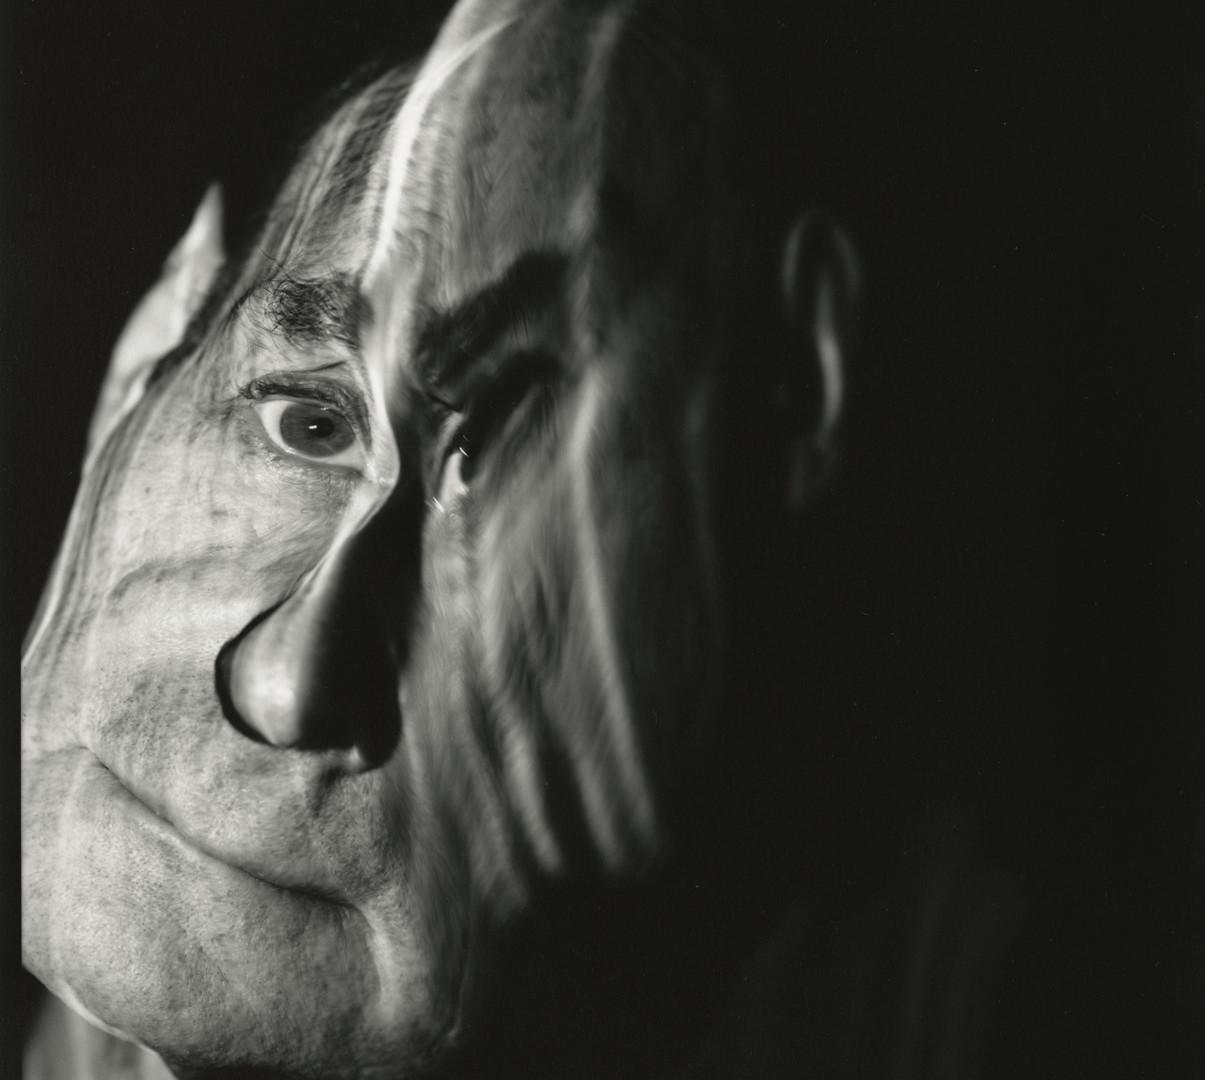 Irving Penn, IP, Photograph of Self (F), New York, 1993